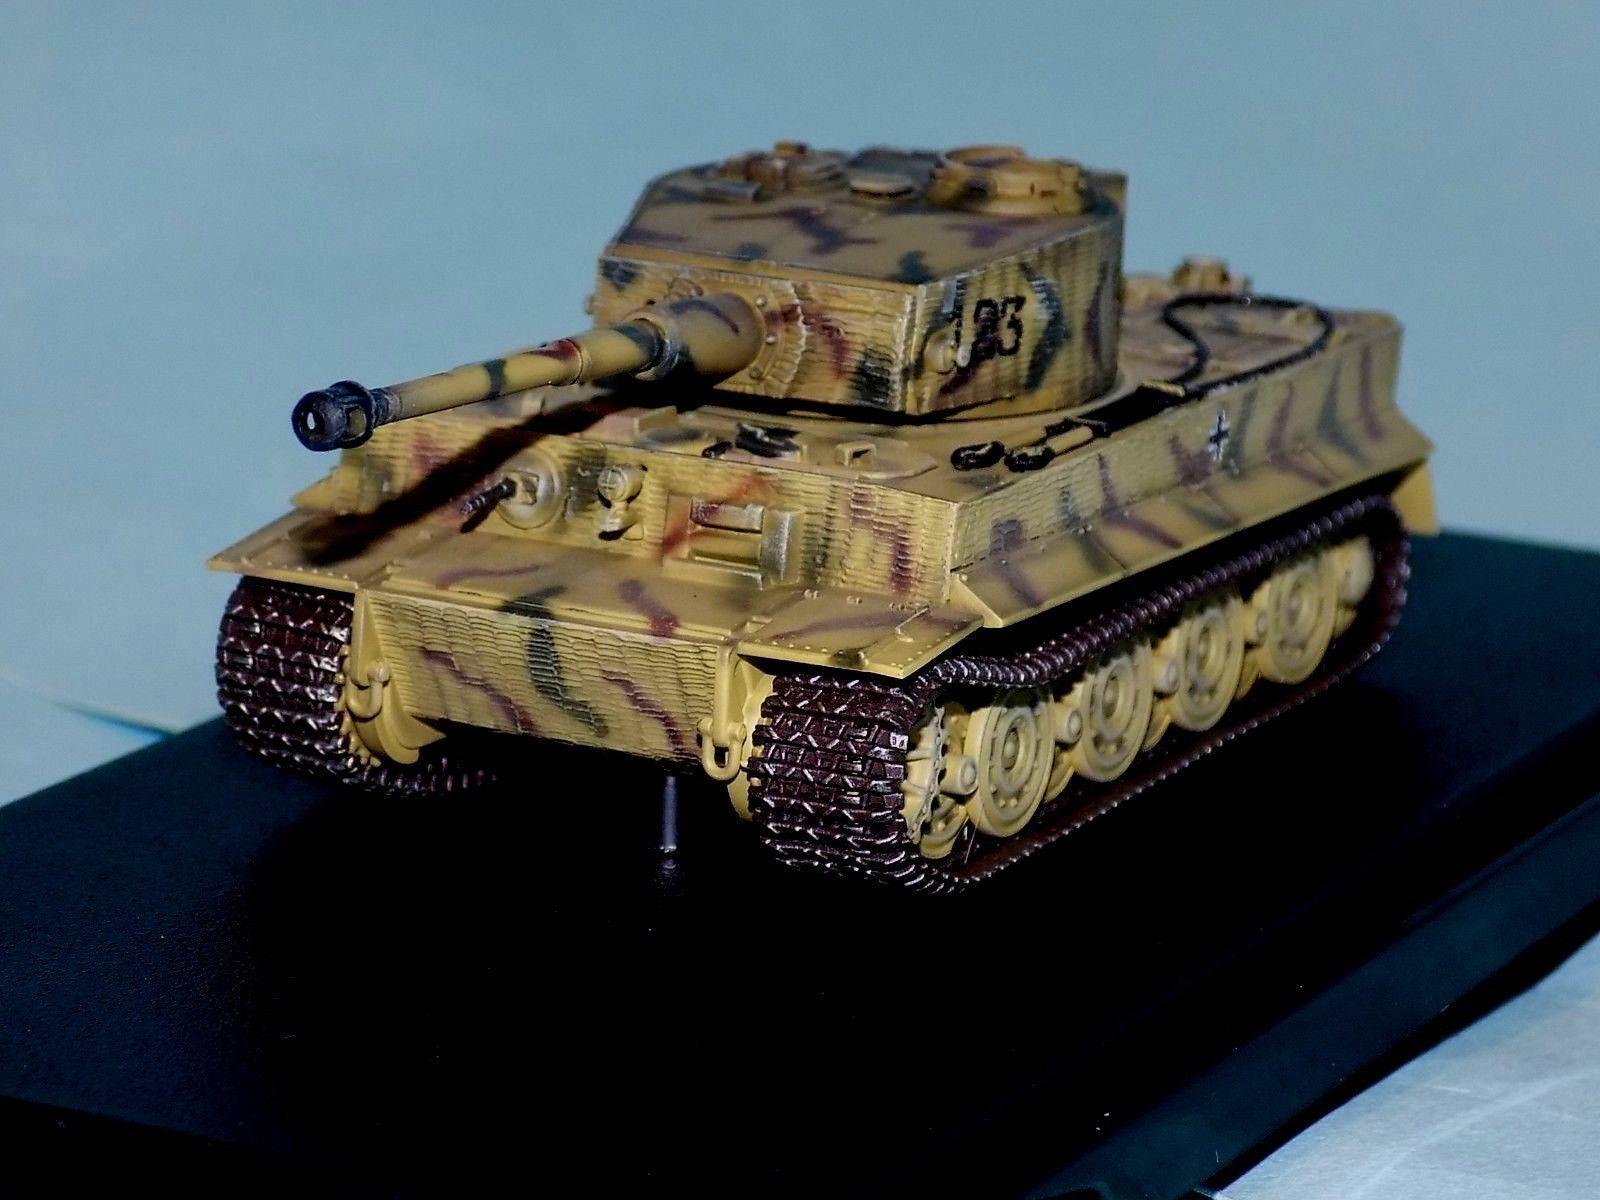 ventas de salida Tiger I I I kurzmaul Expo versión frente oriental 1943 armadura de dragón 60320 1 72  forma única